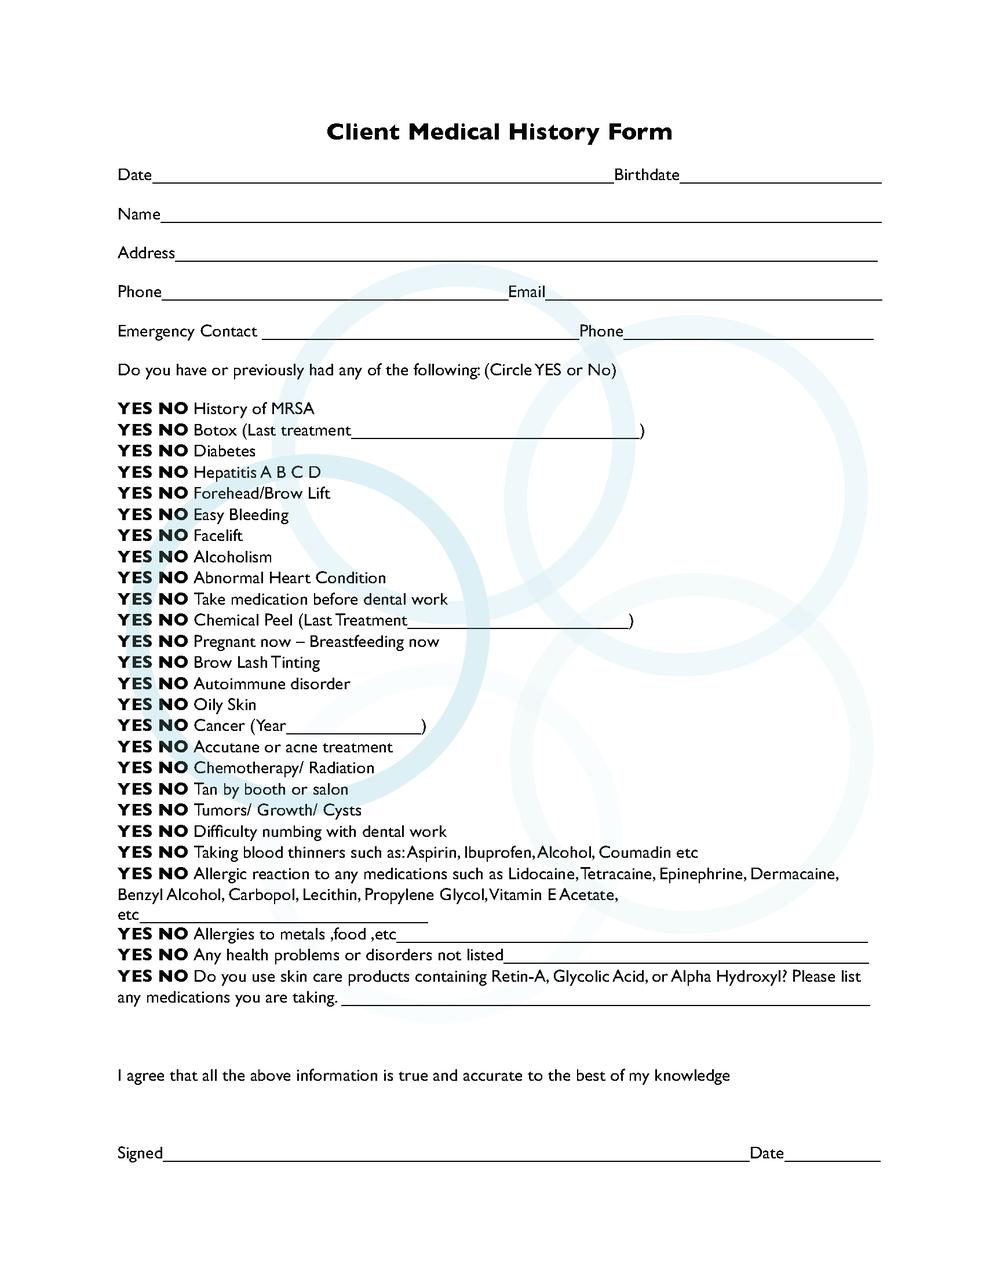 Medical History Form 22718.png